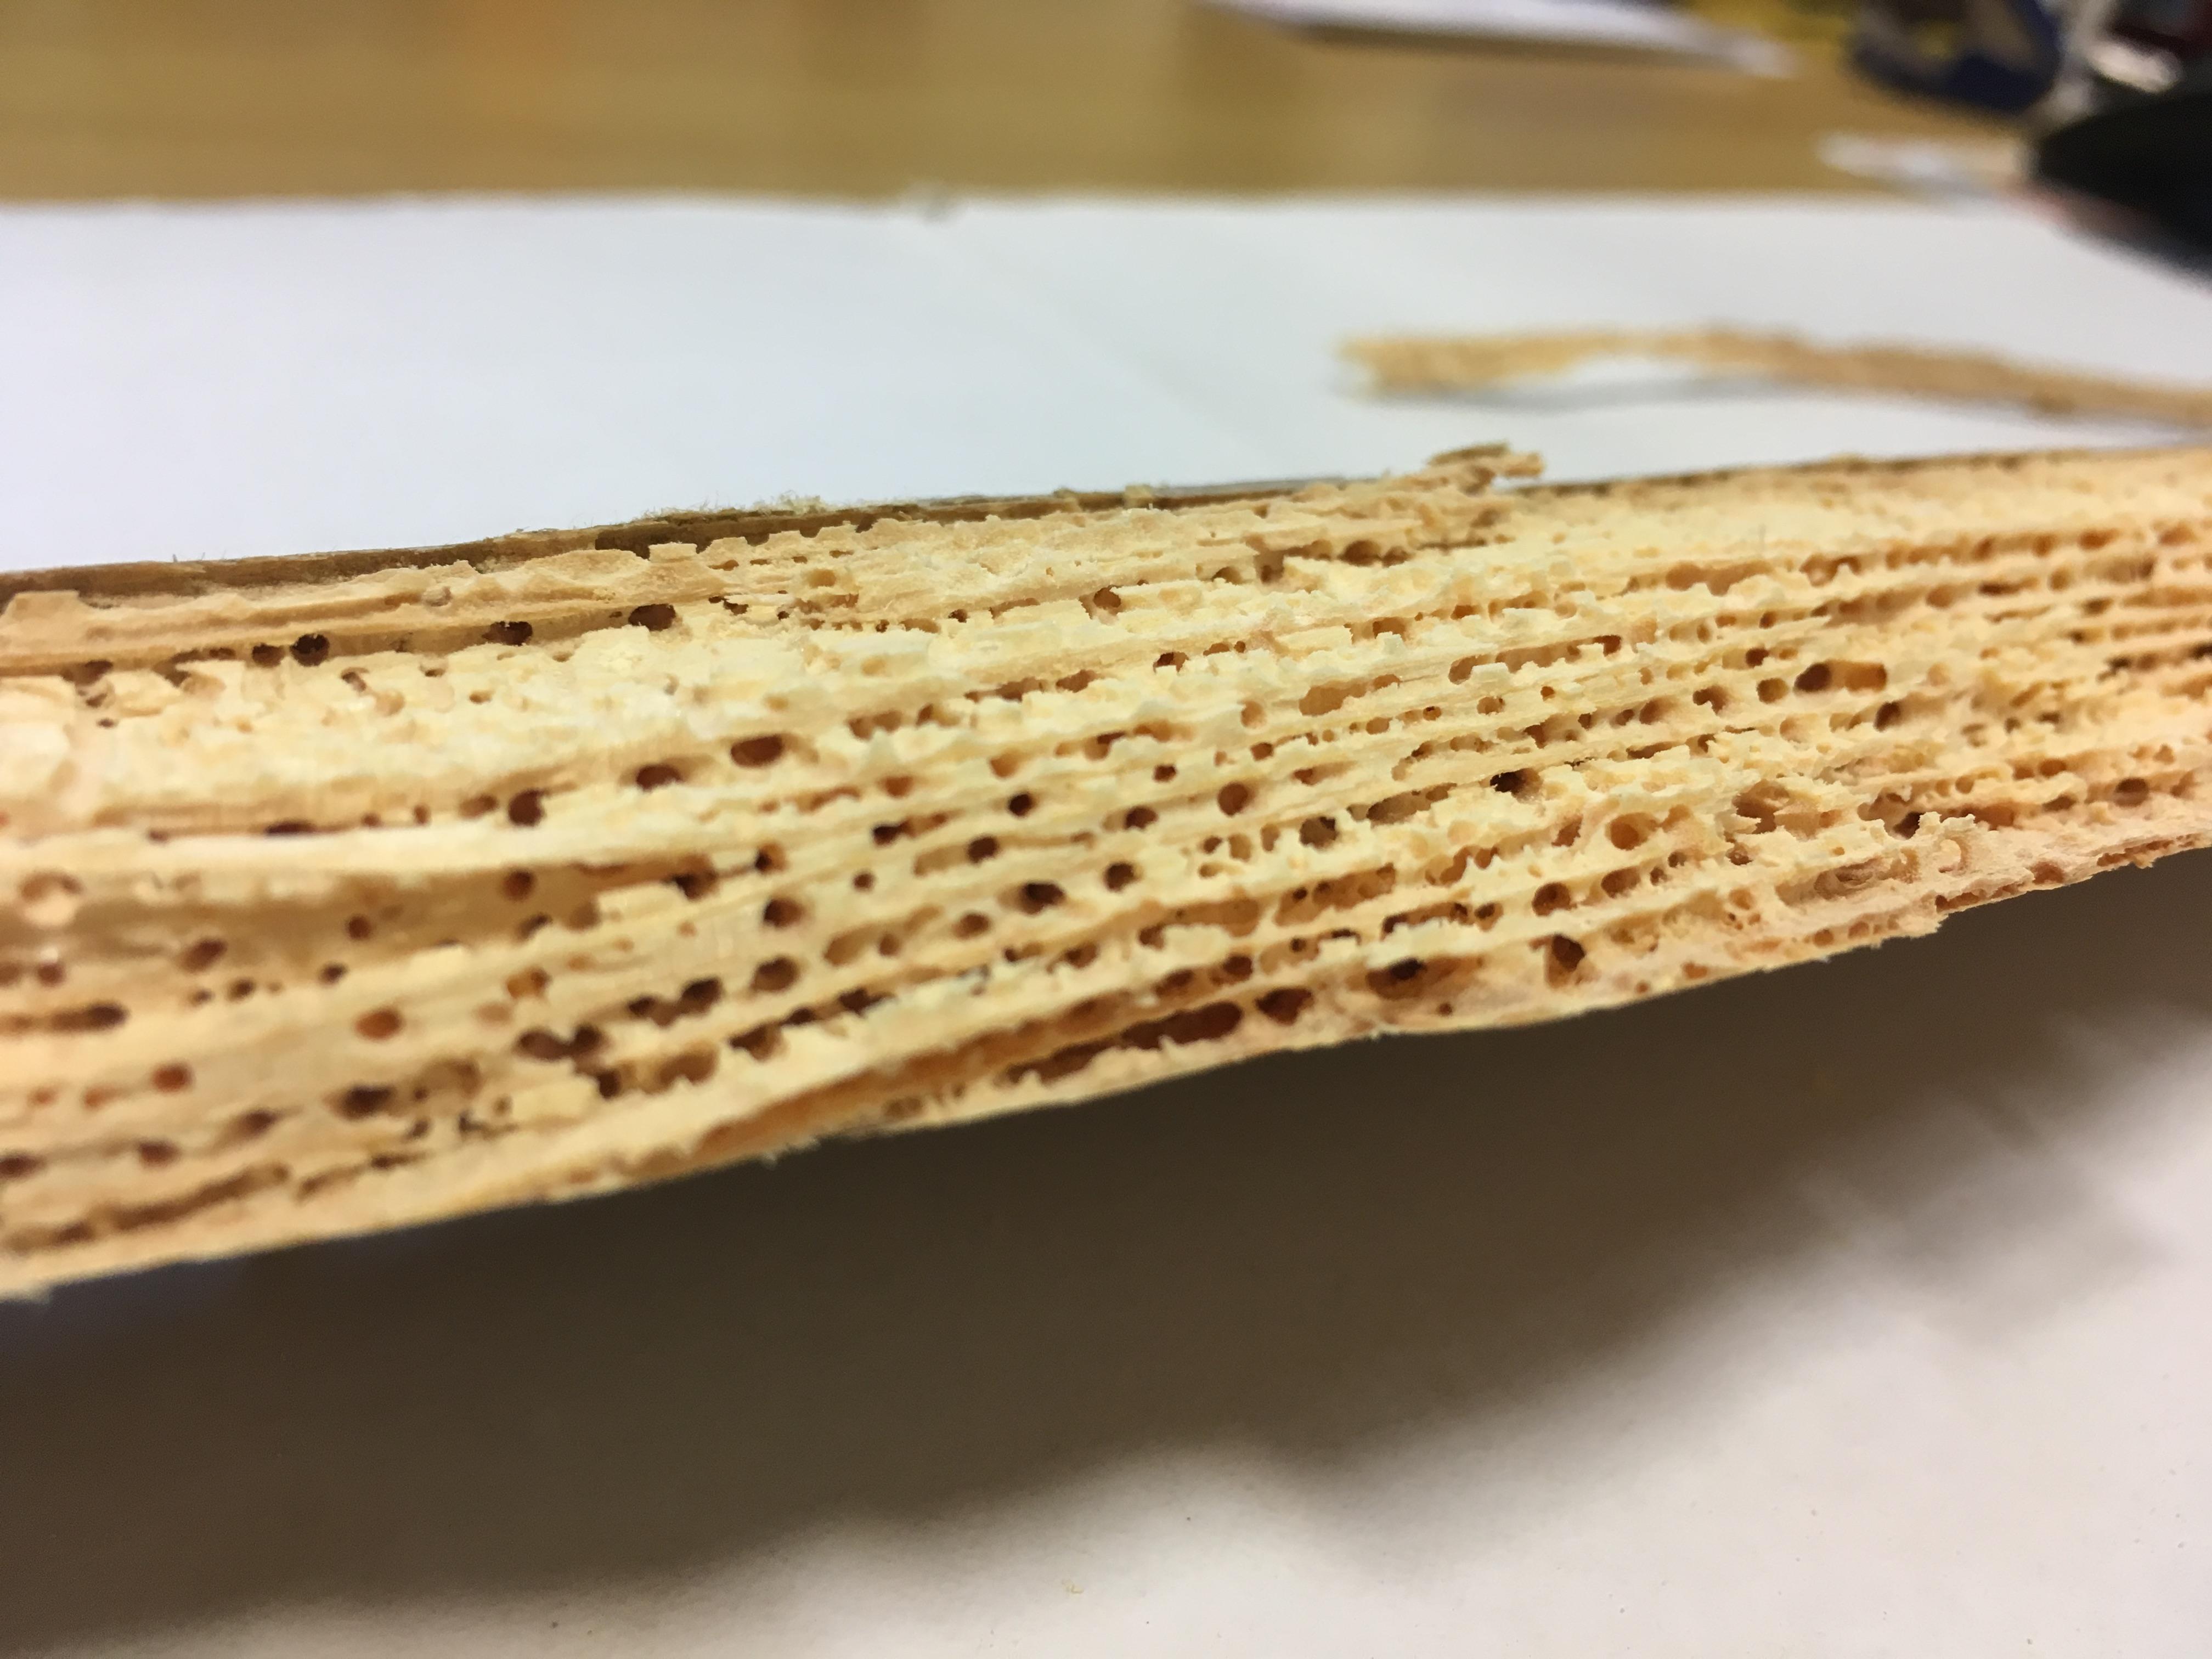 Woodworm Damage to Floorboard